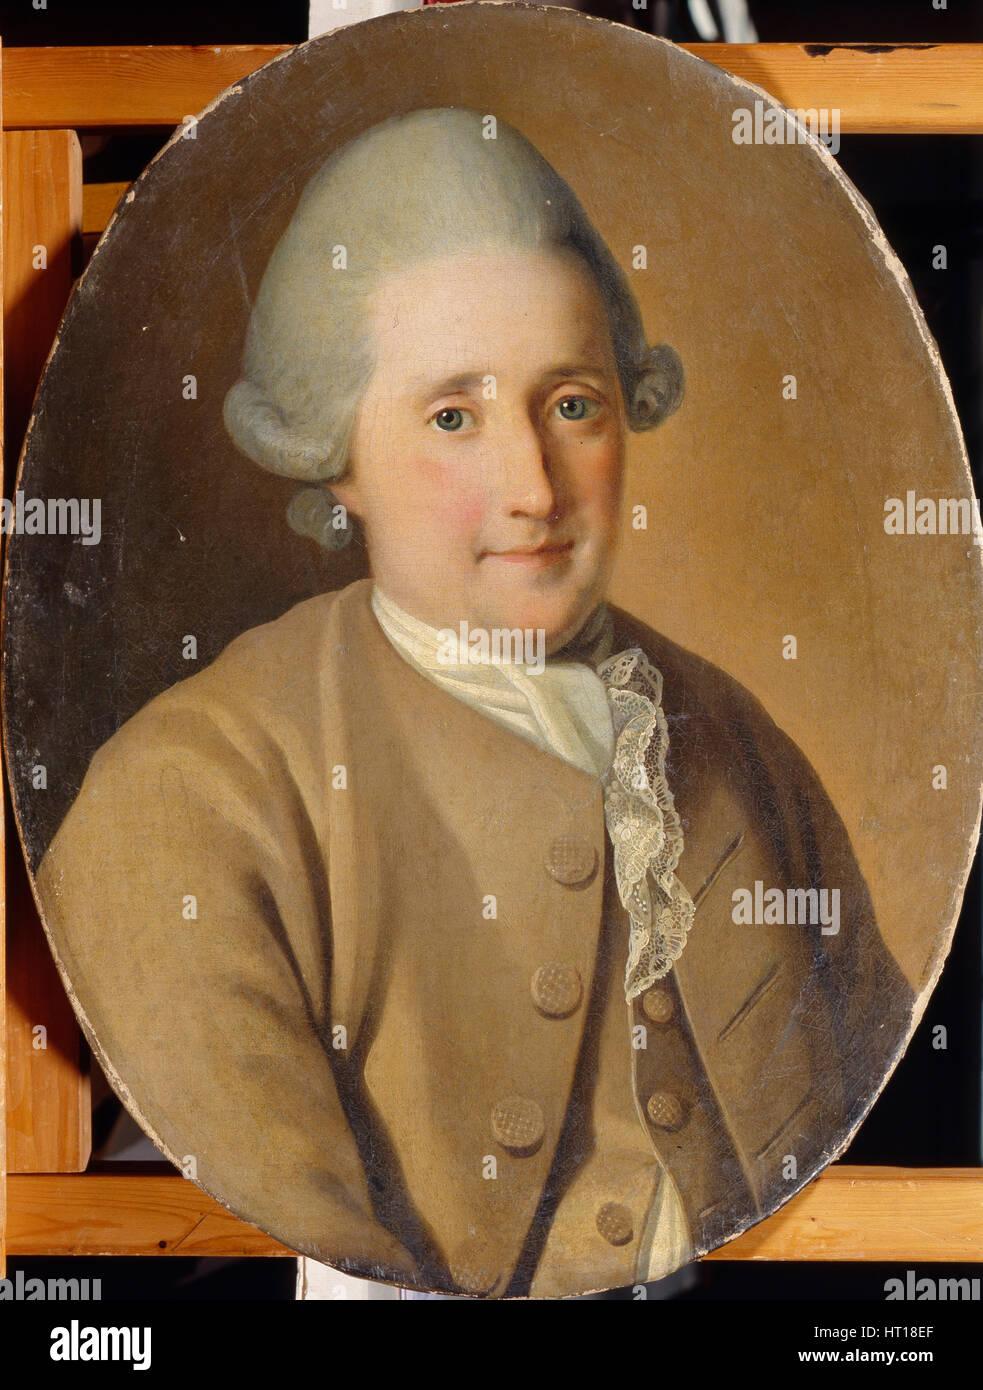 Portrait of Mikhail Gavrilovich Kozhukhov. Artist: Christineck, Carl Ludwig Johann (1732/3-1792/4) - Stock Image